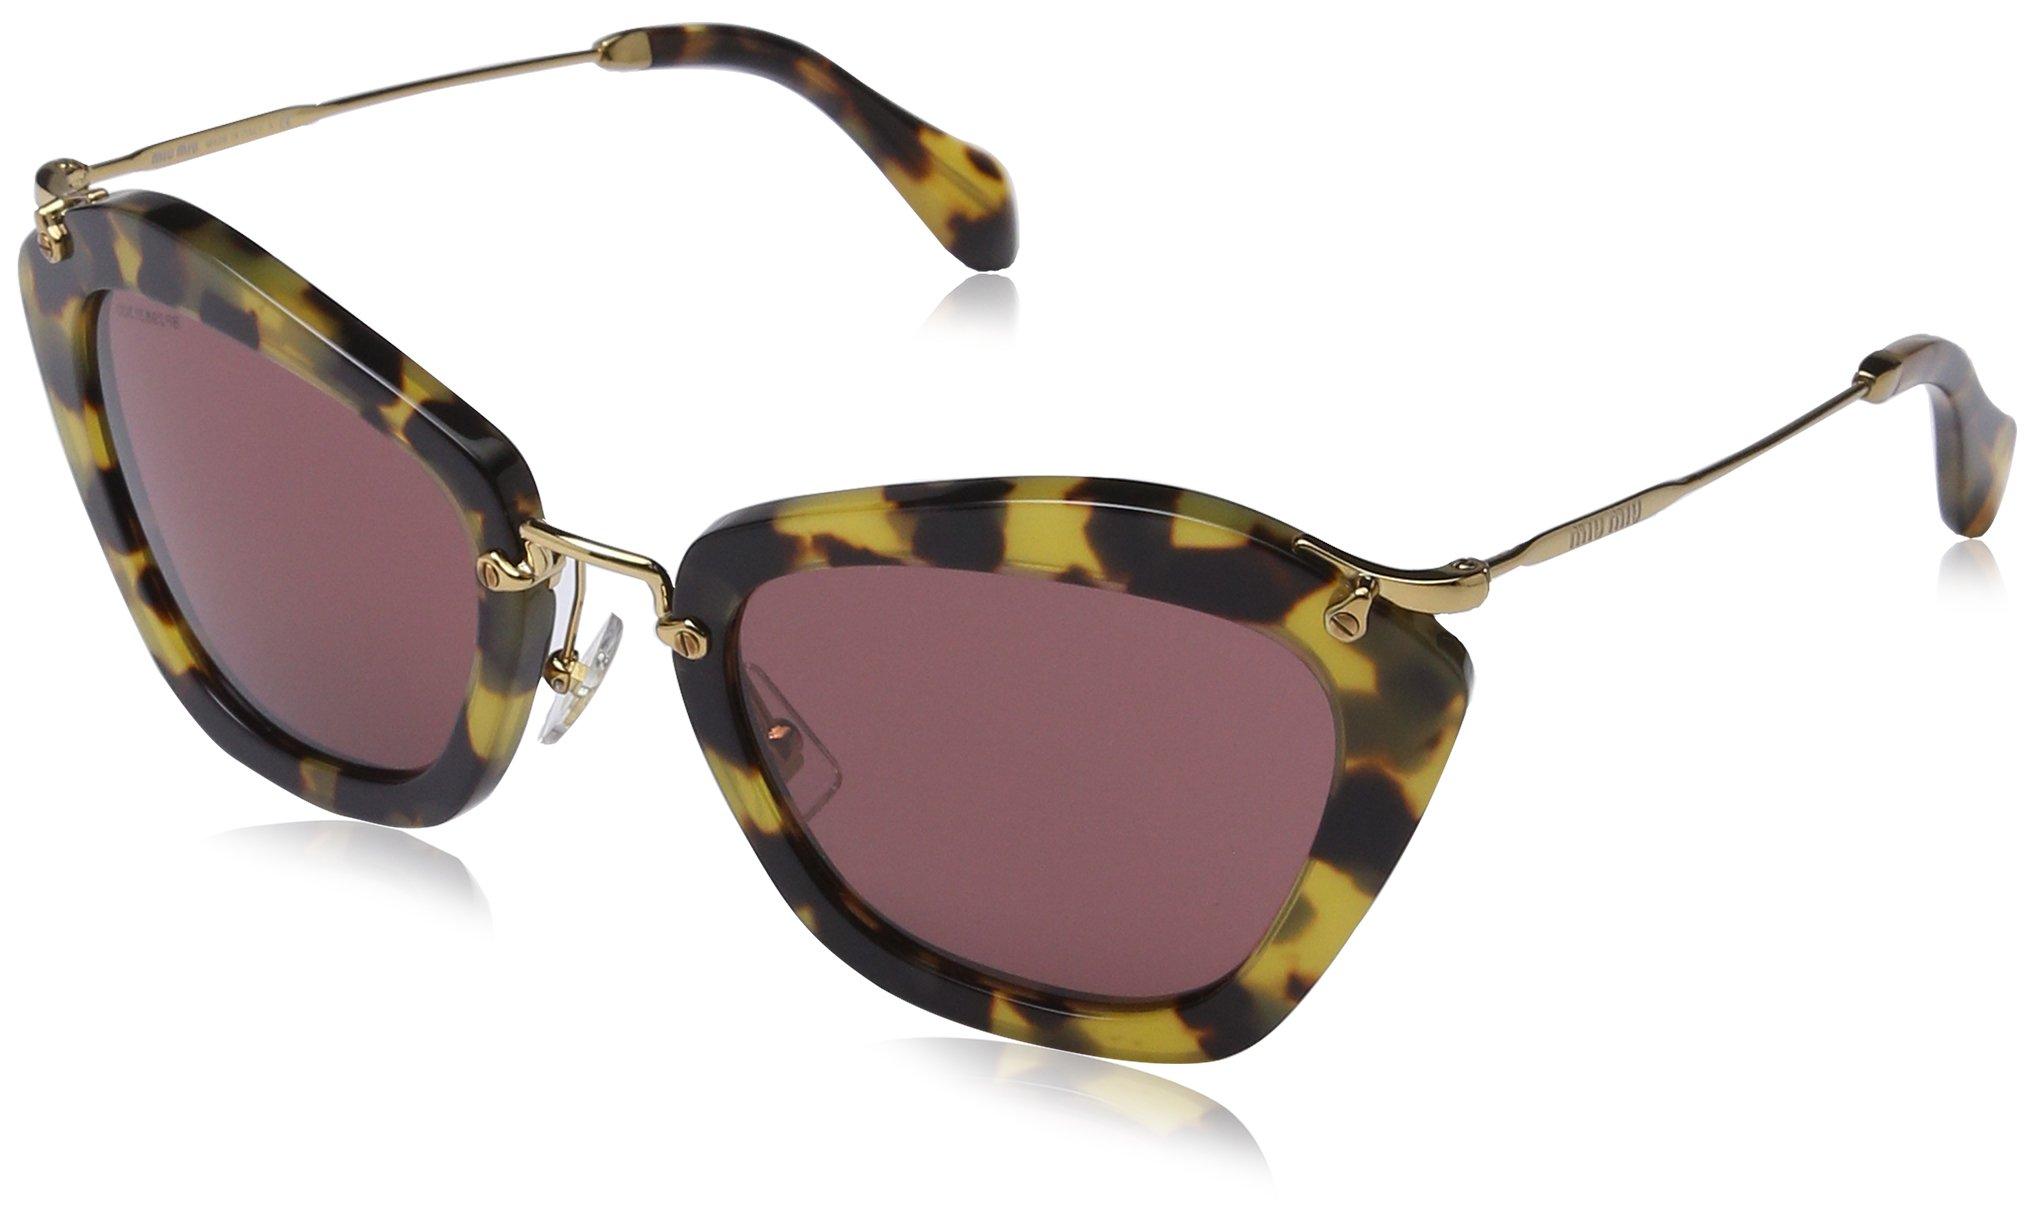 7866f98fb904 Miu Miu MU10NS 7S00A0 Noir Sunglasses